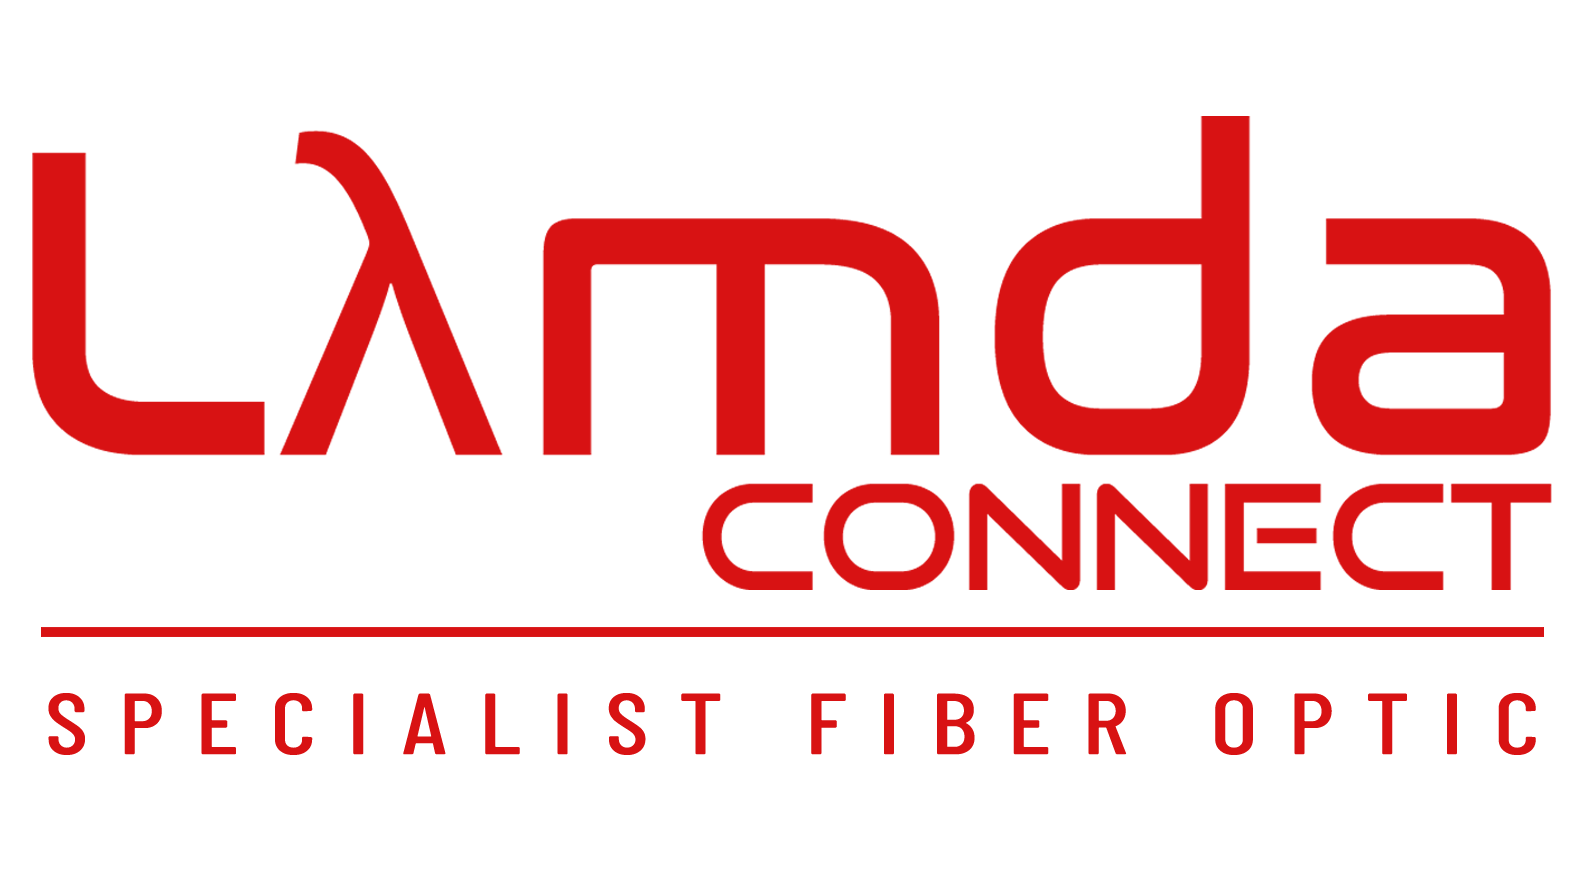 LAMDA CONNECT